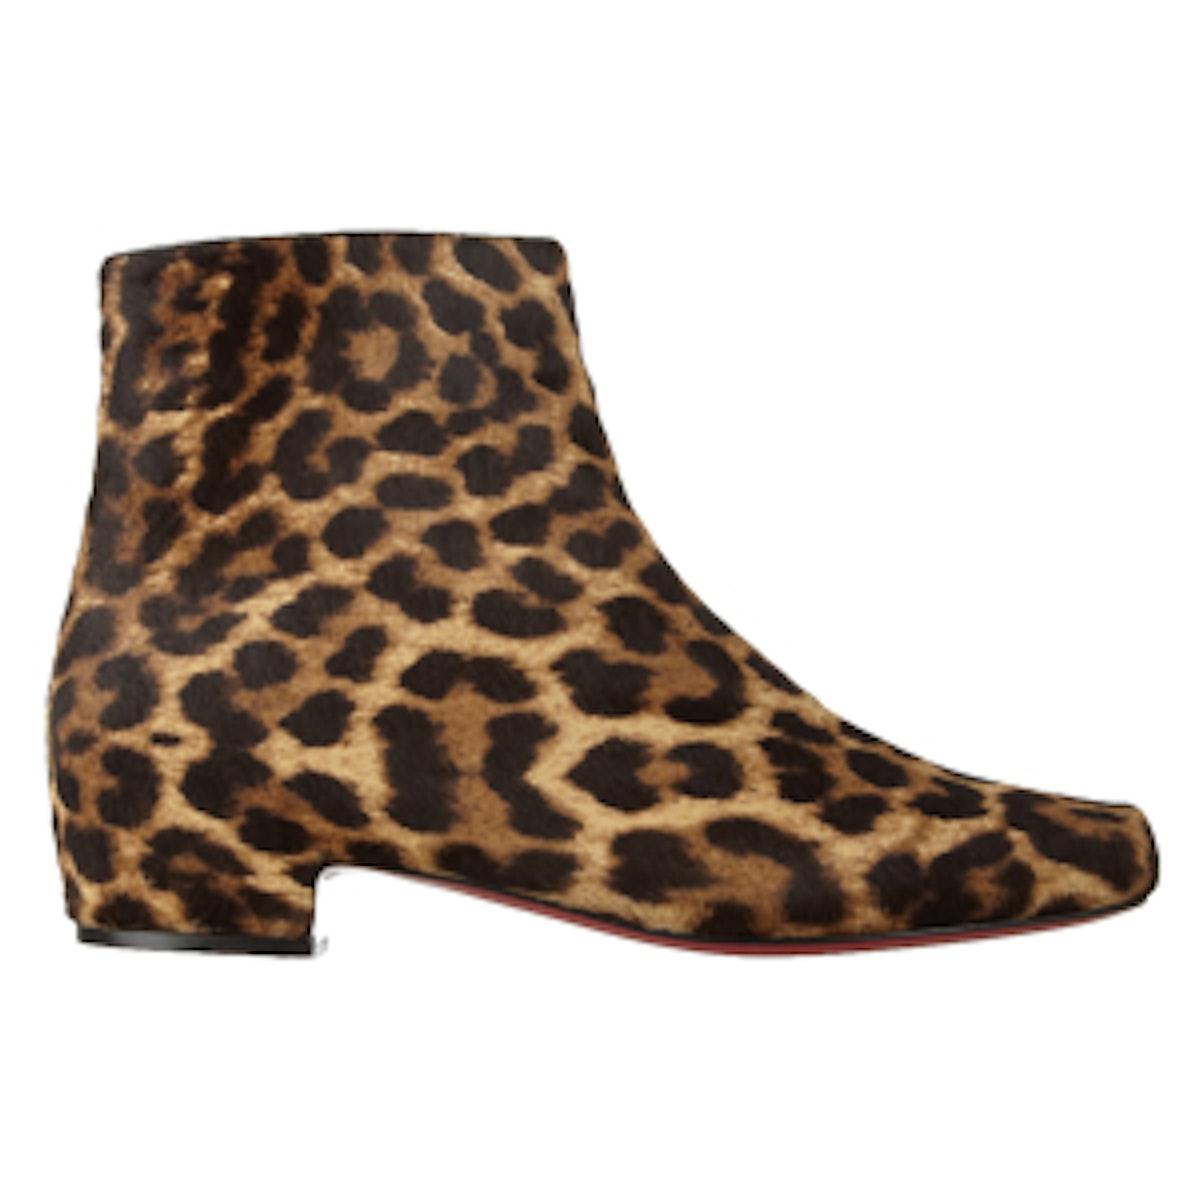 Tounoir Leopard-Print Calf Hair Ankle Boots